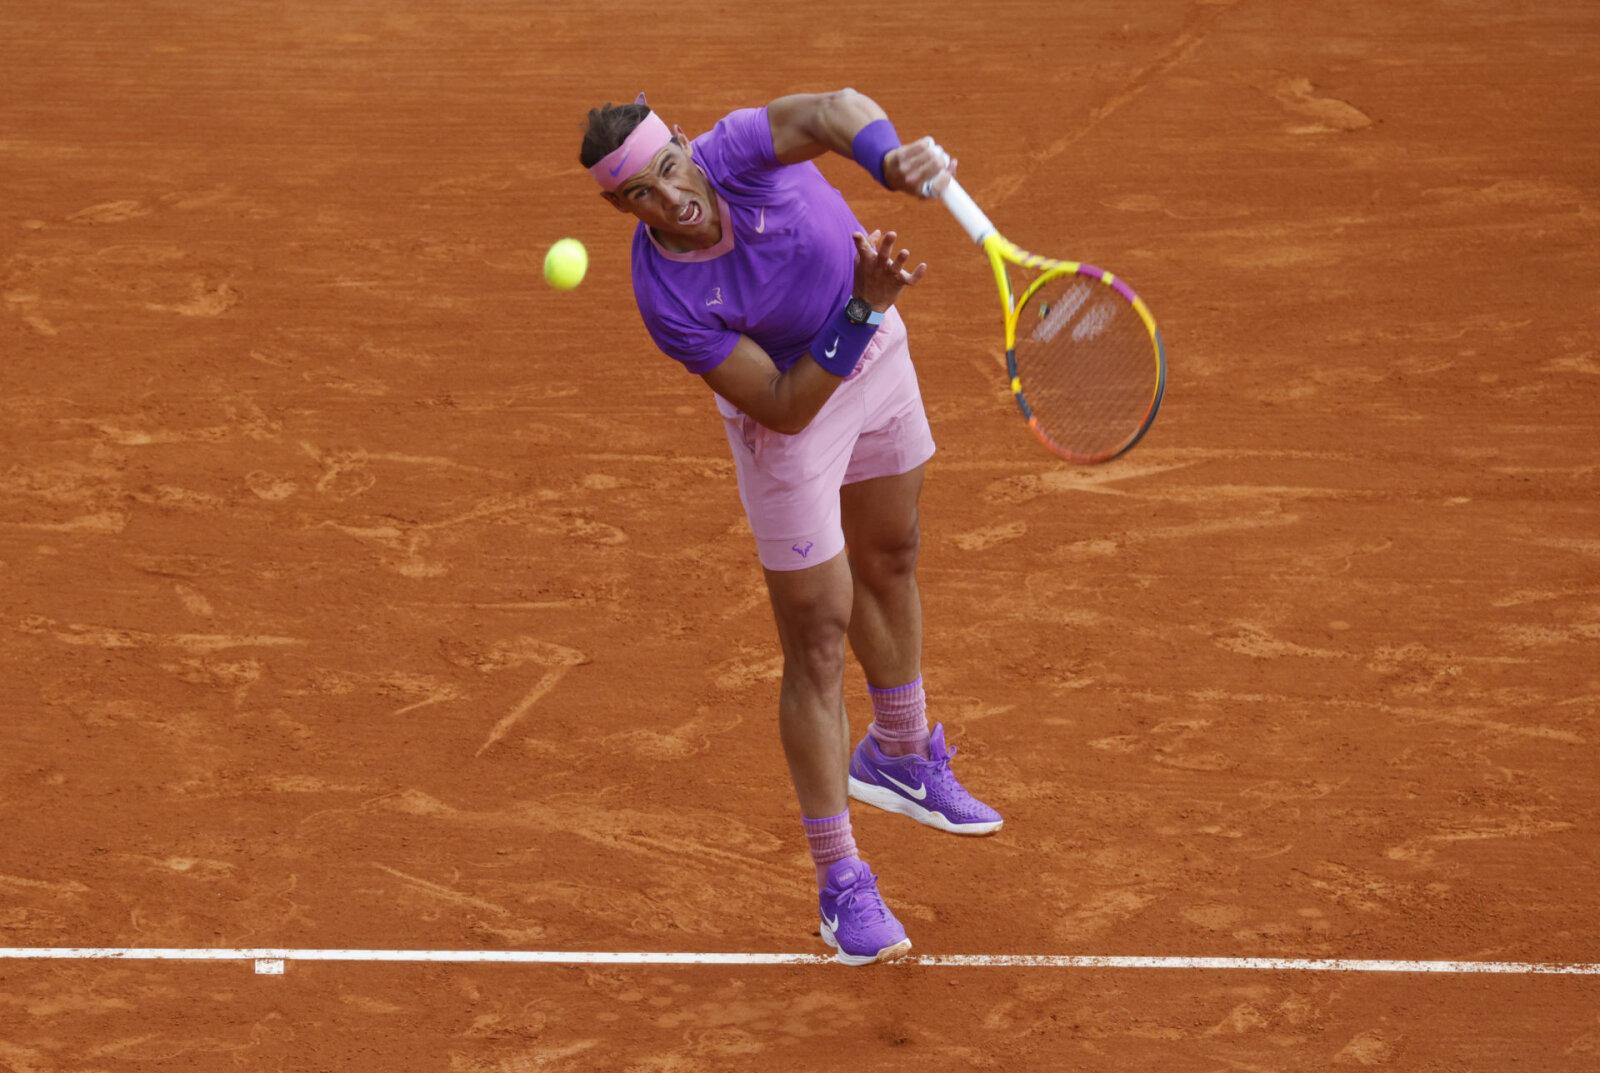 Madrid Open 2021: Rafael Nadal vs. Alexei Popyrin Tennis Pick and Prediction